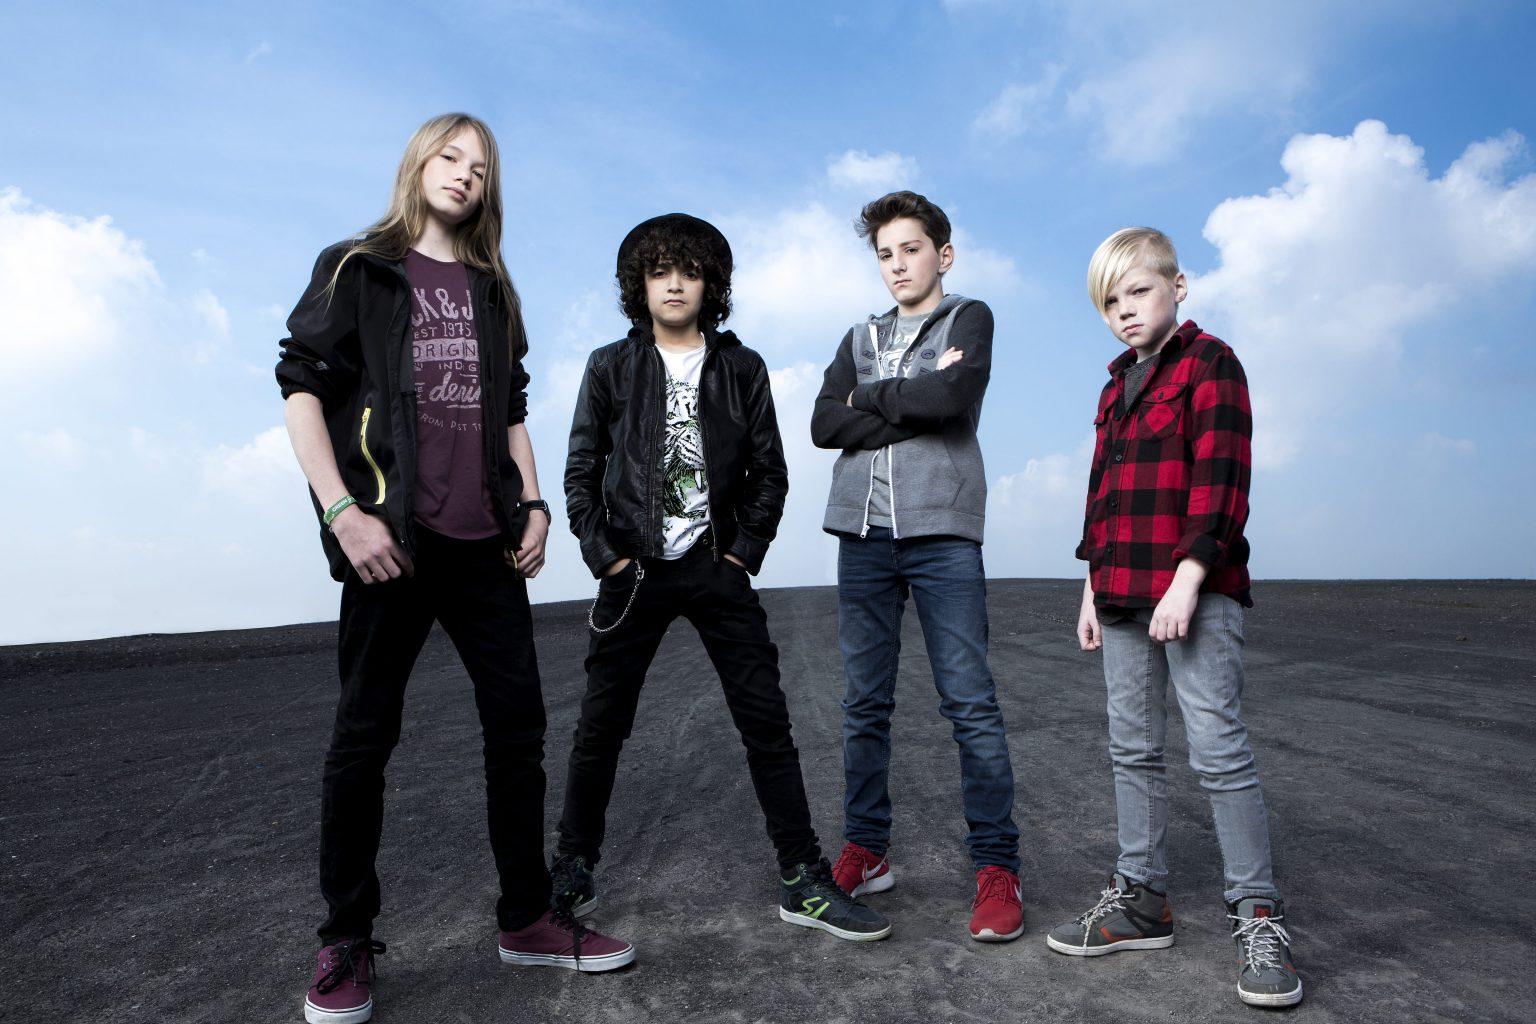 Kinder-Rockband Powerboys: Musik Für Coole Kids